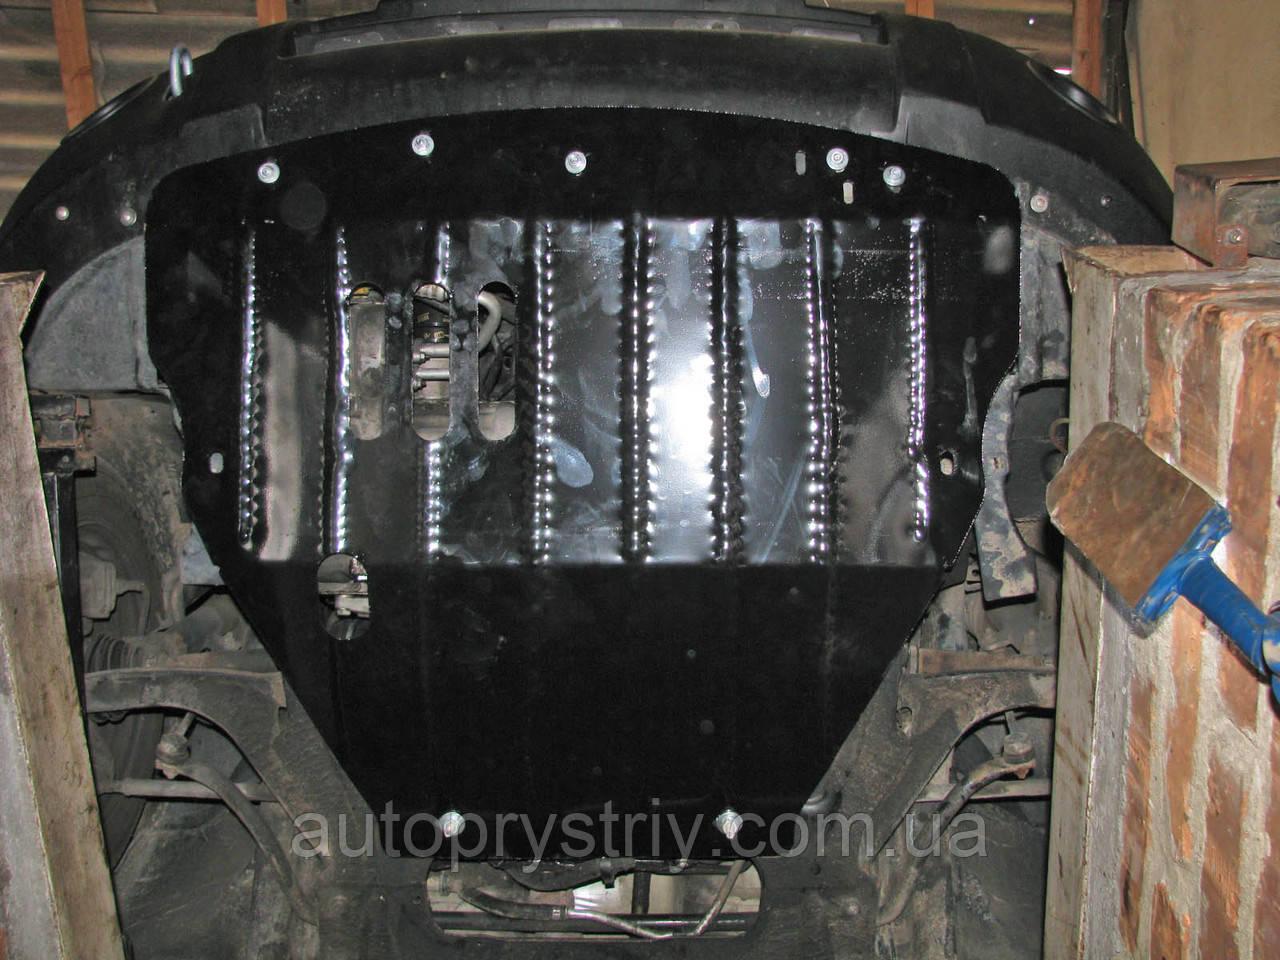 Защита двигателя и КПП Citroen Berlingo (2004-2008) механика 2.0 HDI